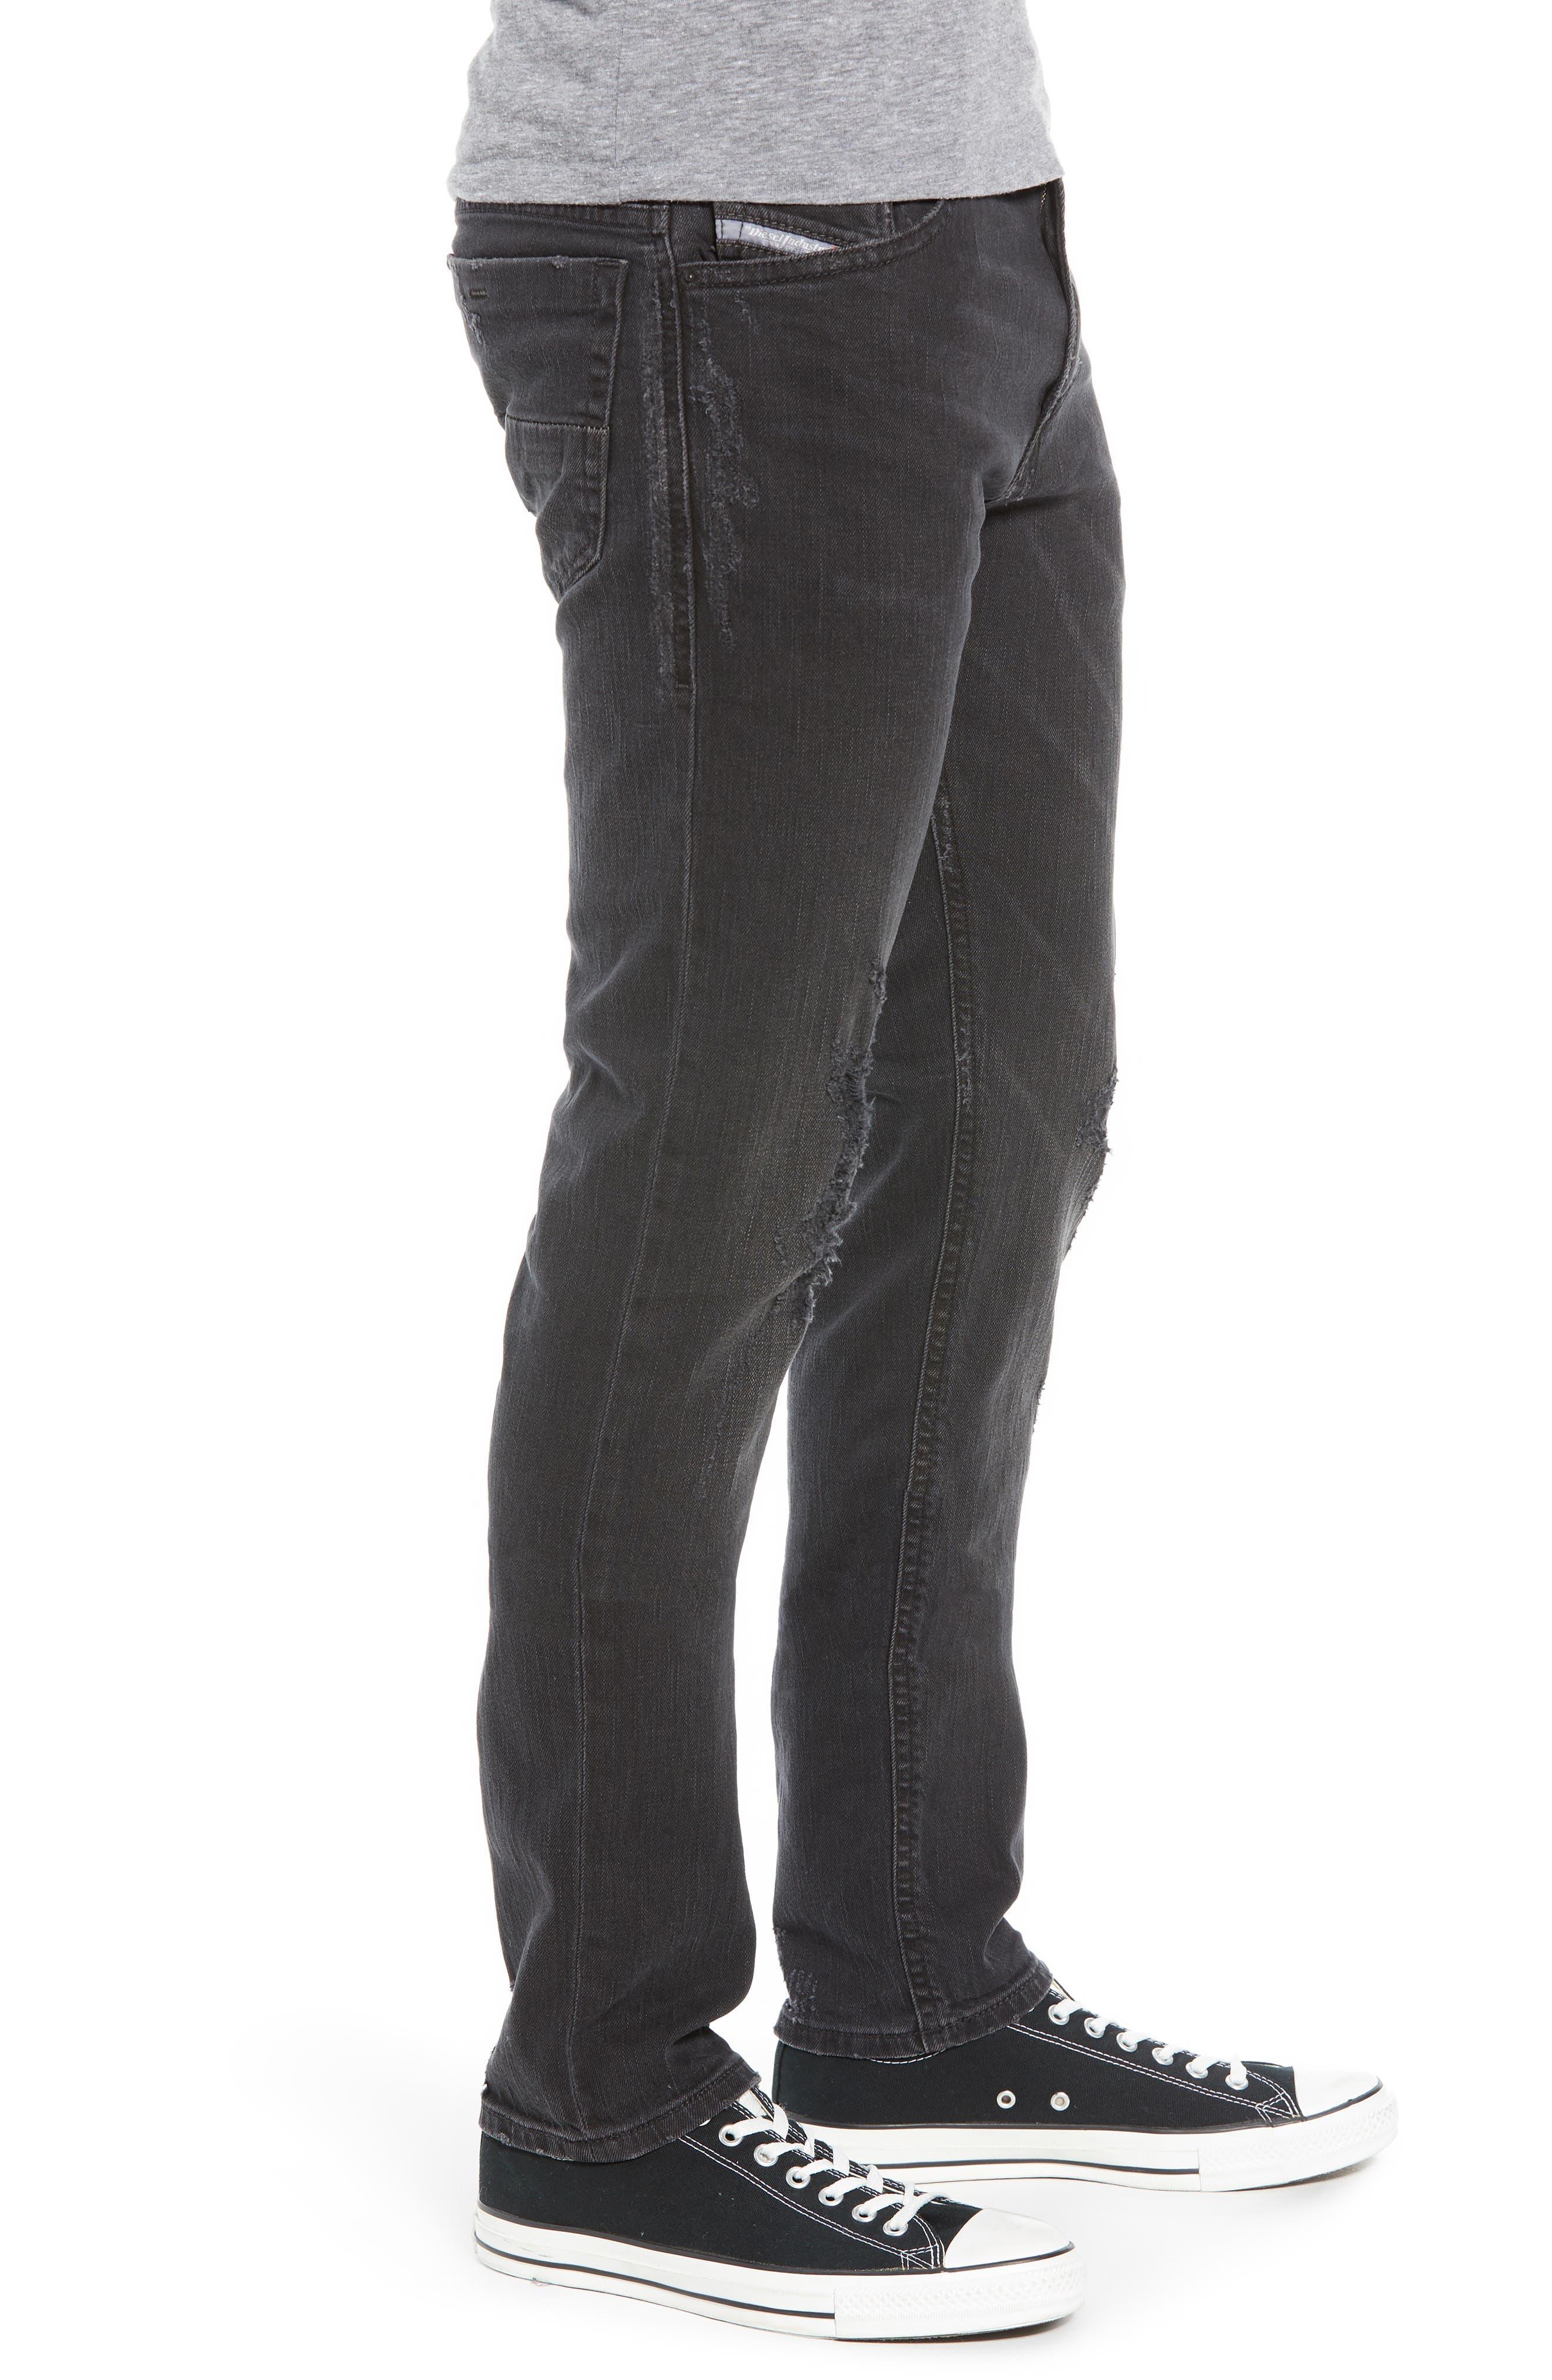 Thommer Skinny Fit Jeans,                             Alternate thumbnail 3, color,                             CN013